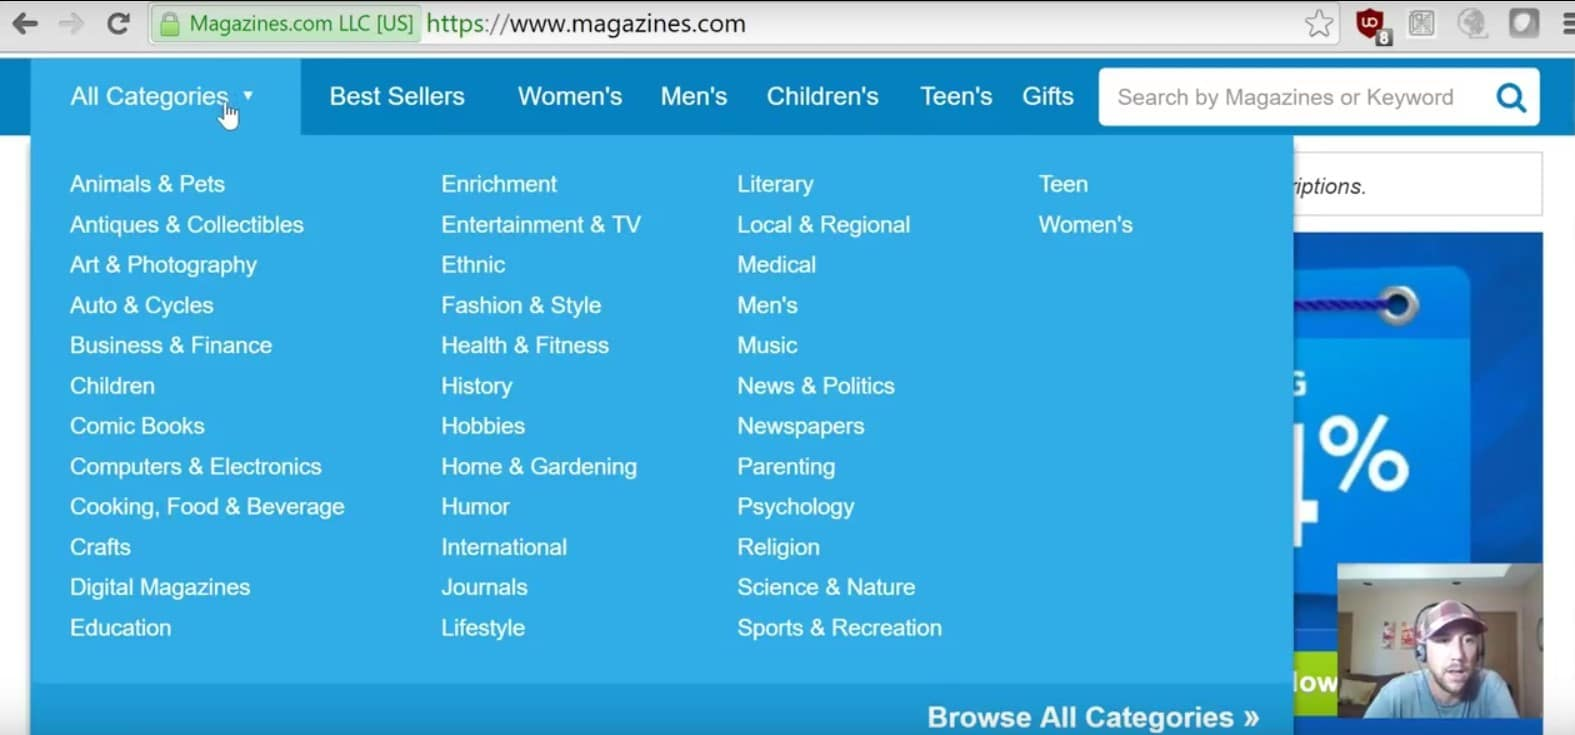 Niche website market research on magazines.com step 1